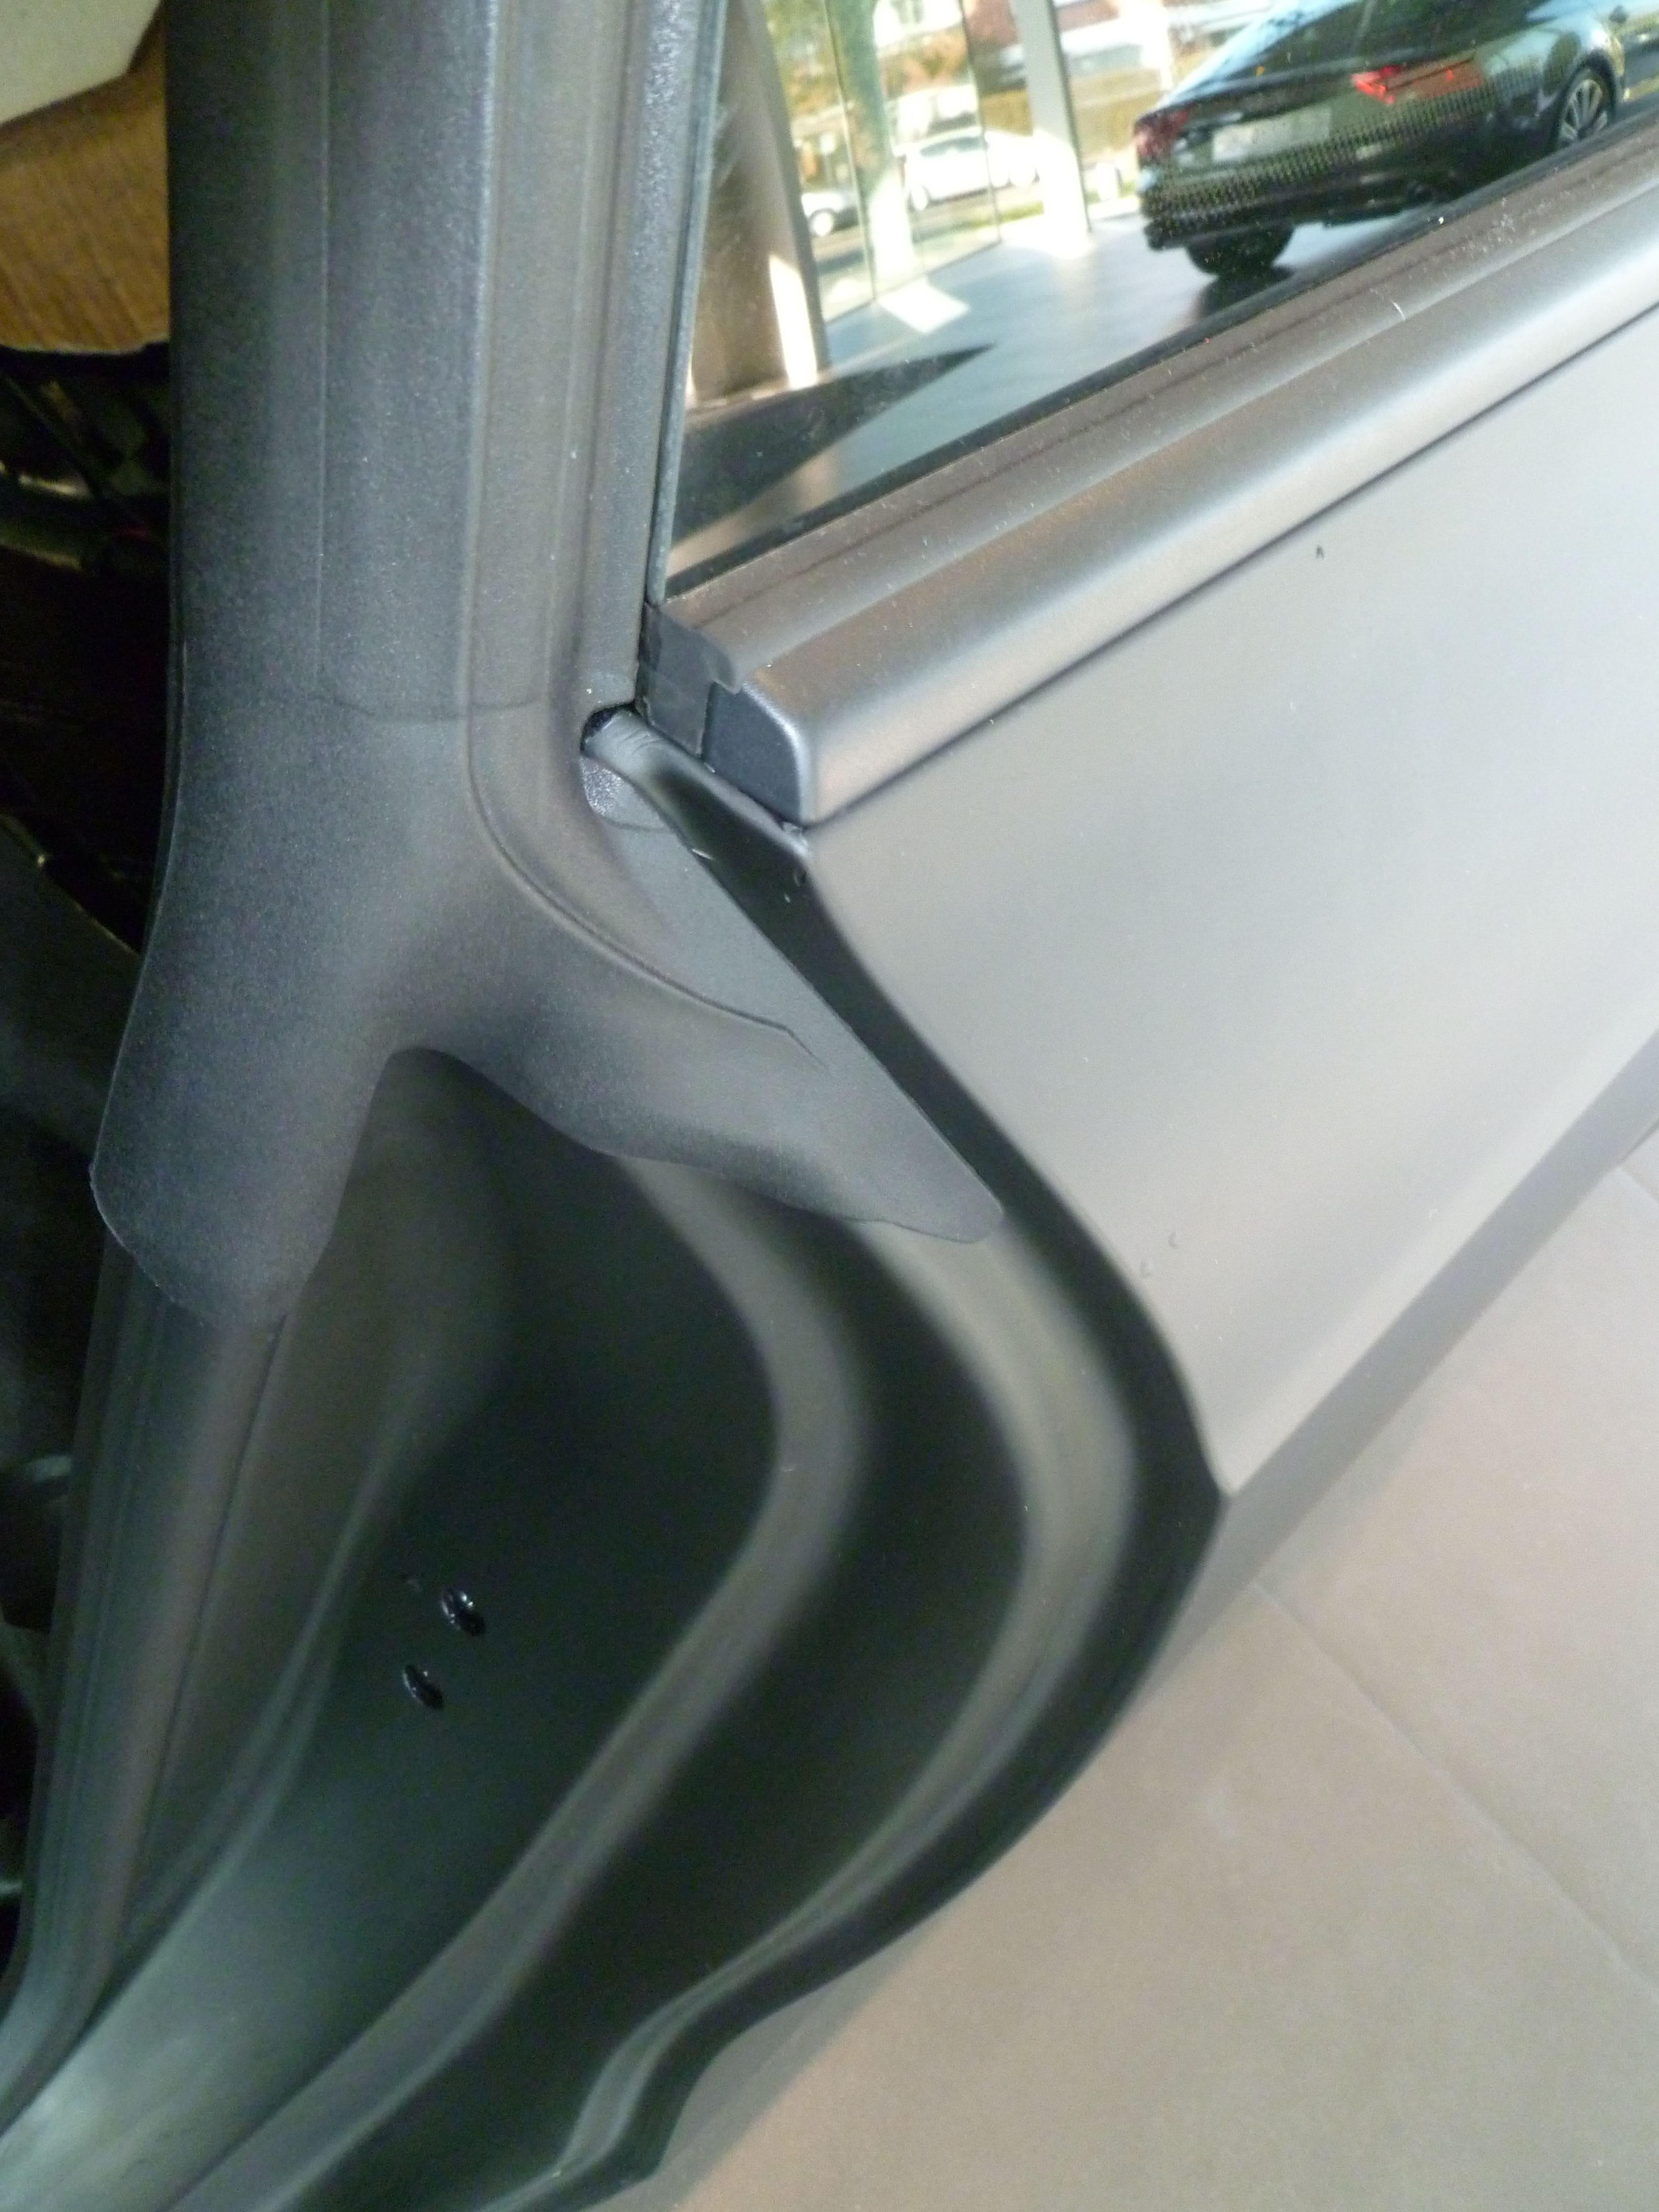 Audi A5 Coupe met Mat Zwarte Wrap, Carwrapping door Wrapmyride.nu Foto-nr:4642, ©2021